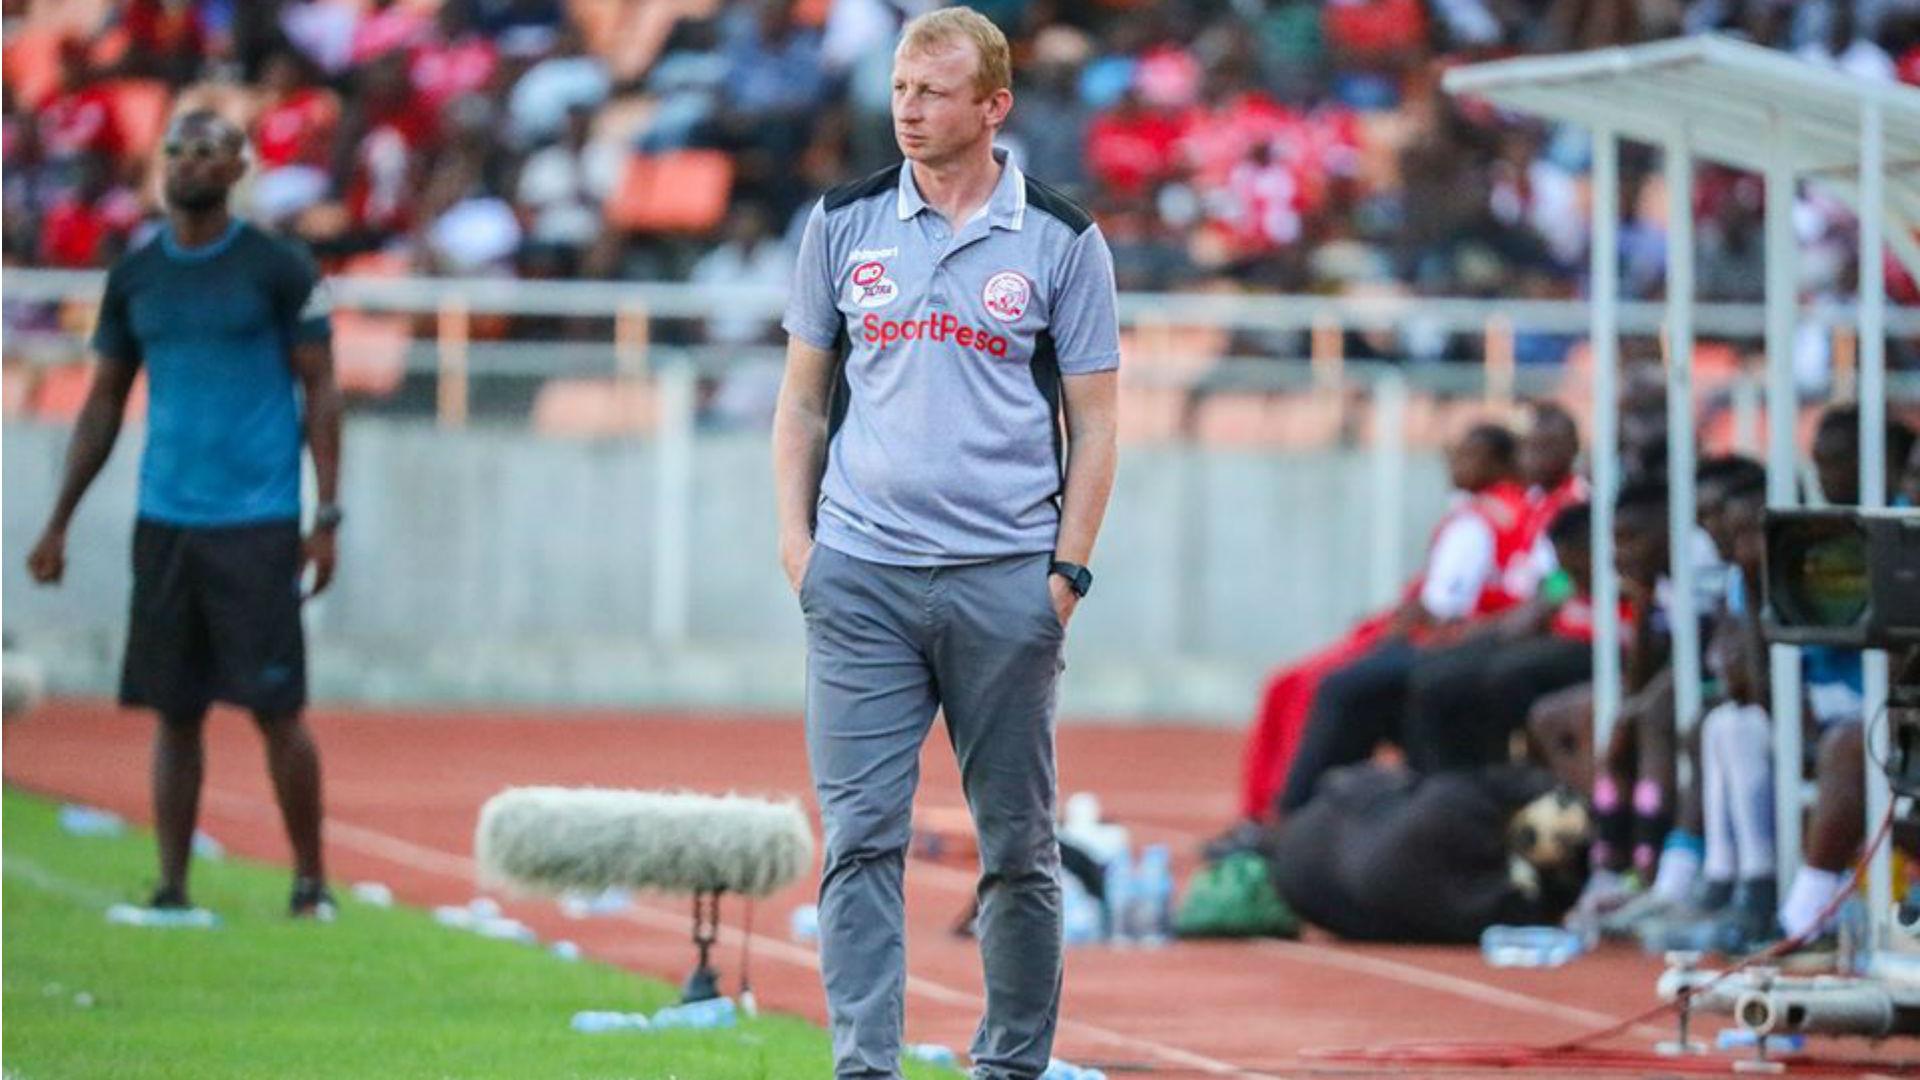 Simba SC coach Vanderbroek unhappy with state of Kirumba pitch